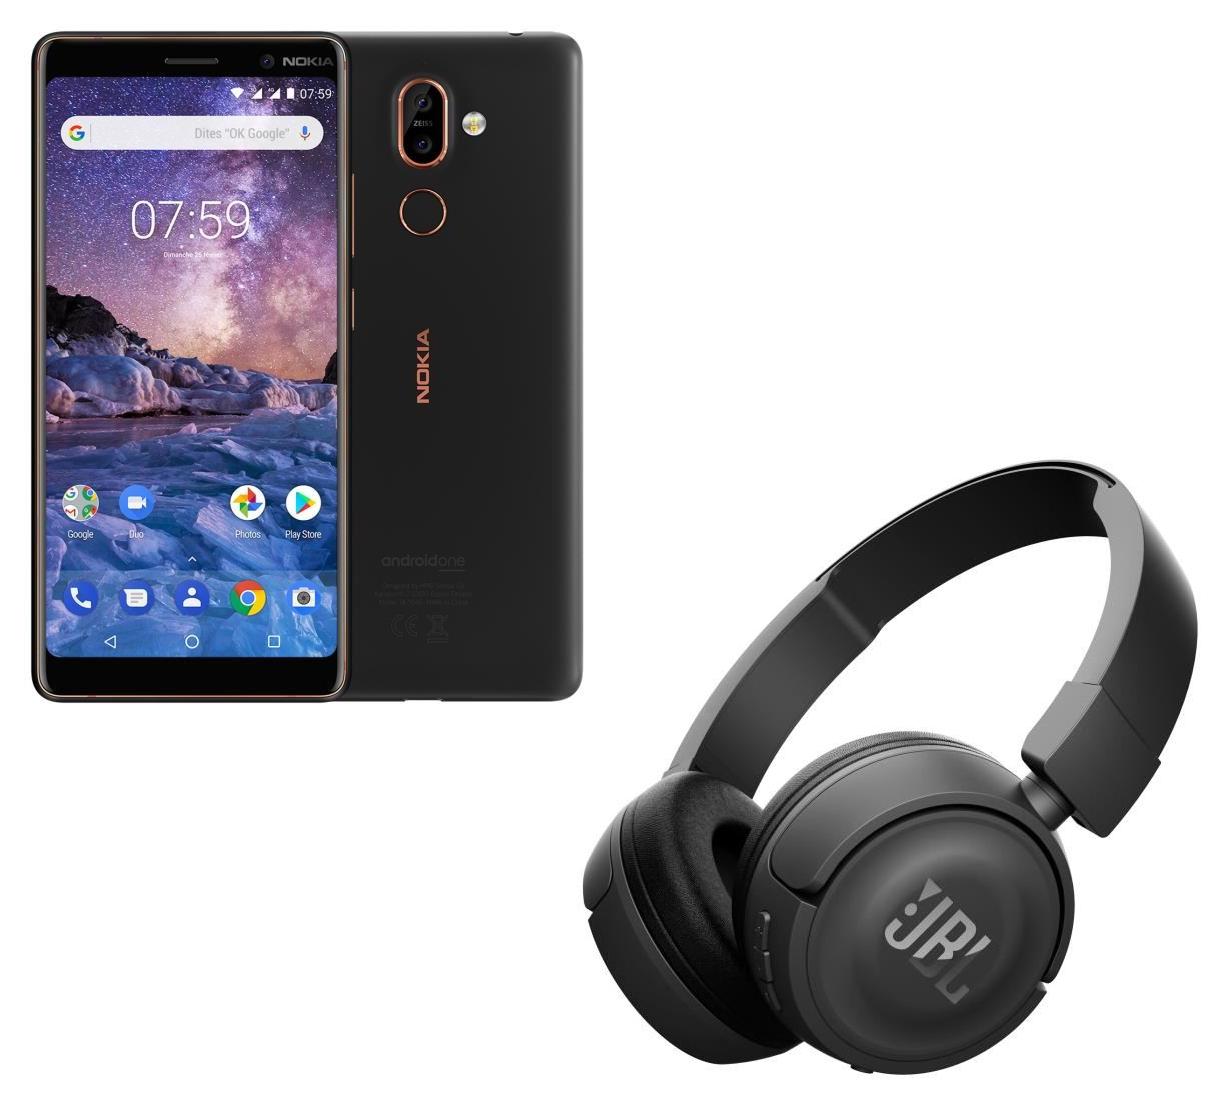 "[Cdiscount à volonté] Précommande : Smartphone 6"" Nokia 7 Plus - Android One, Full HD+, Snapdragon 660, RAM 4 Go, ROM 64 Go + Casque JBL T450BT (via formulaire)"